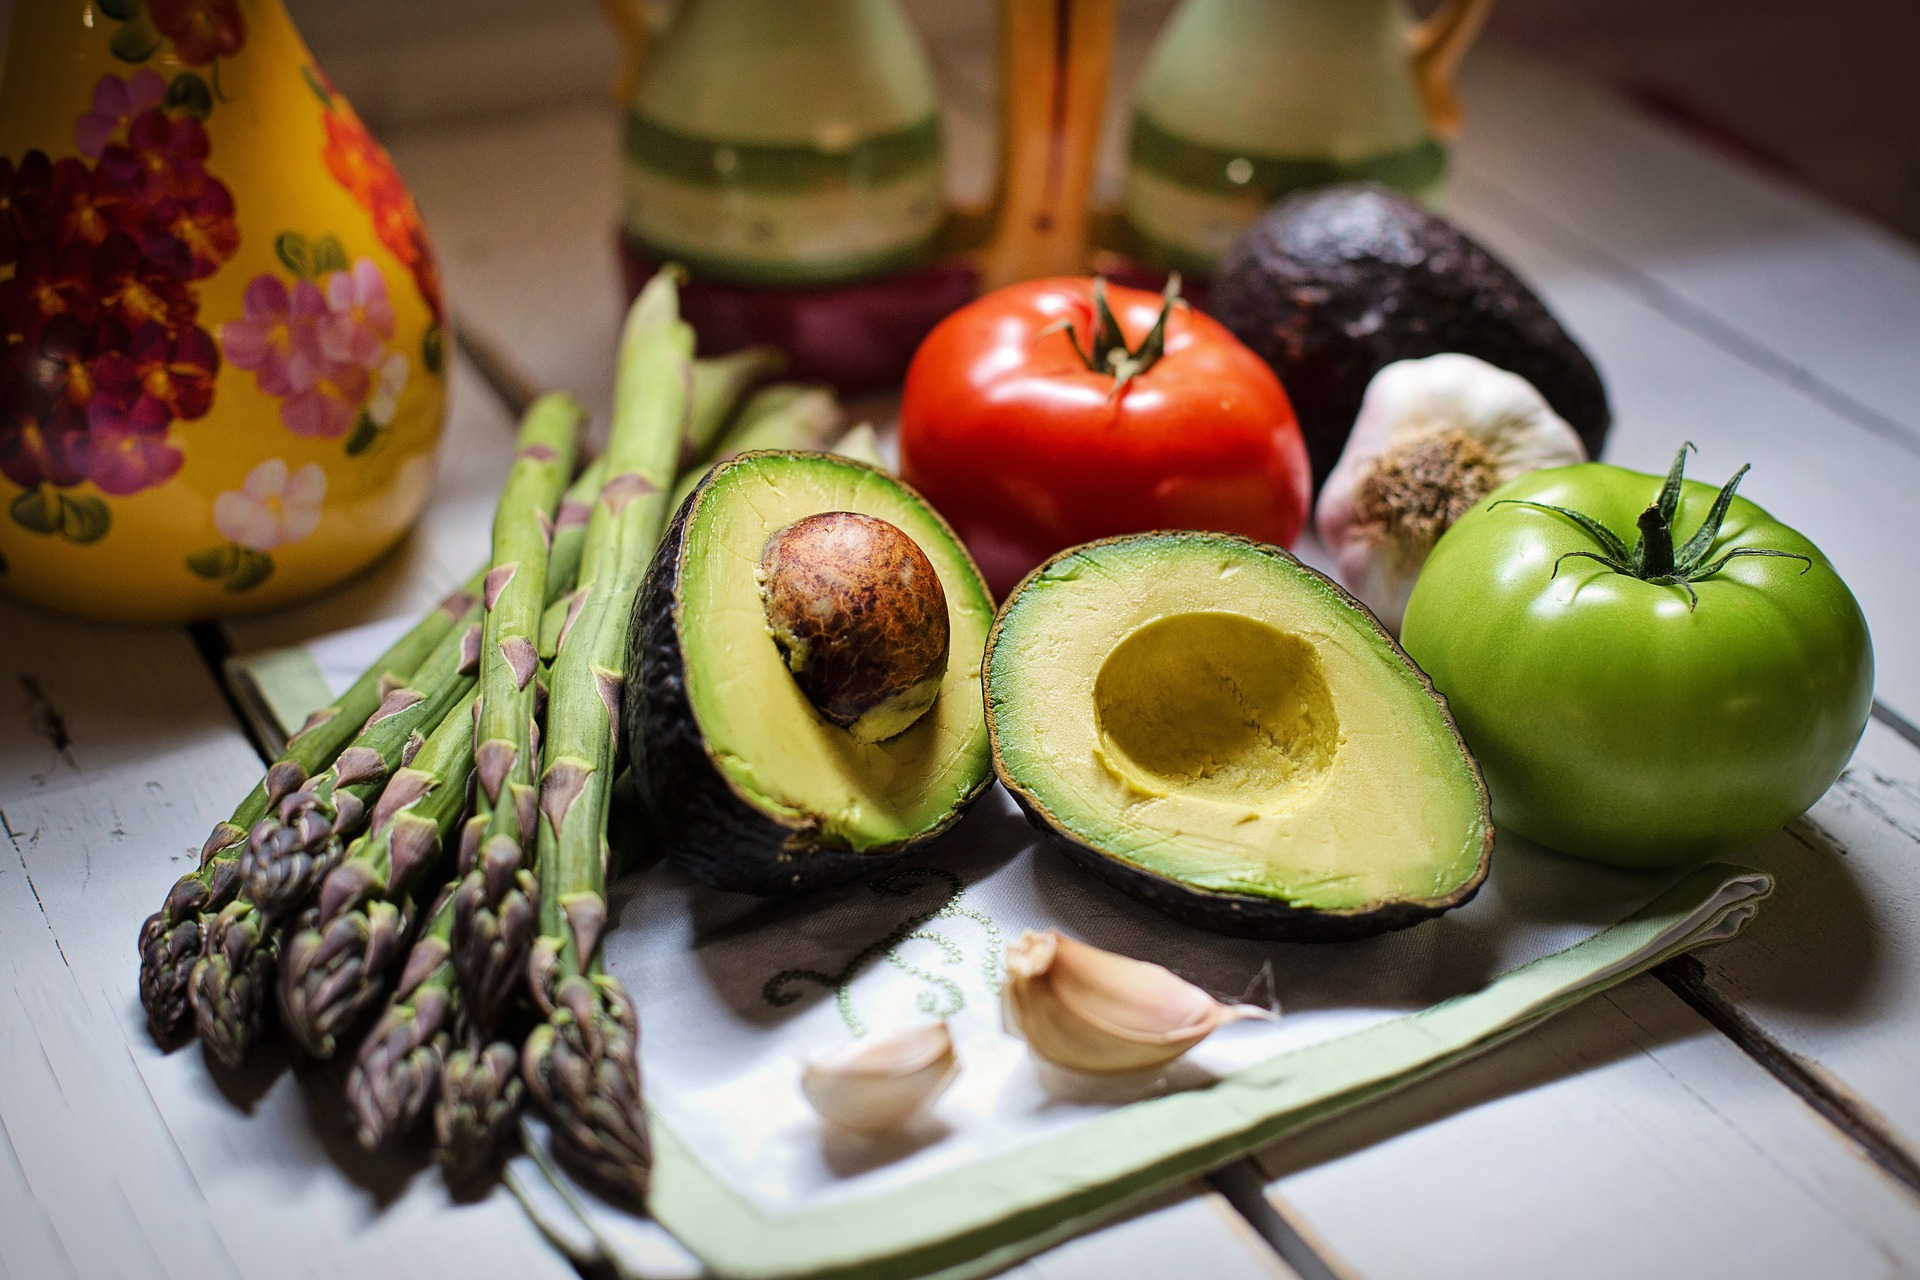 Dieta e microbiota